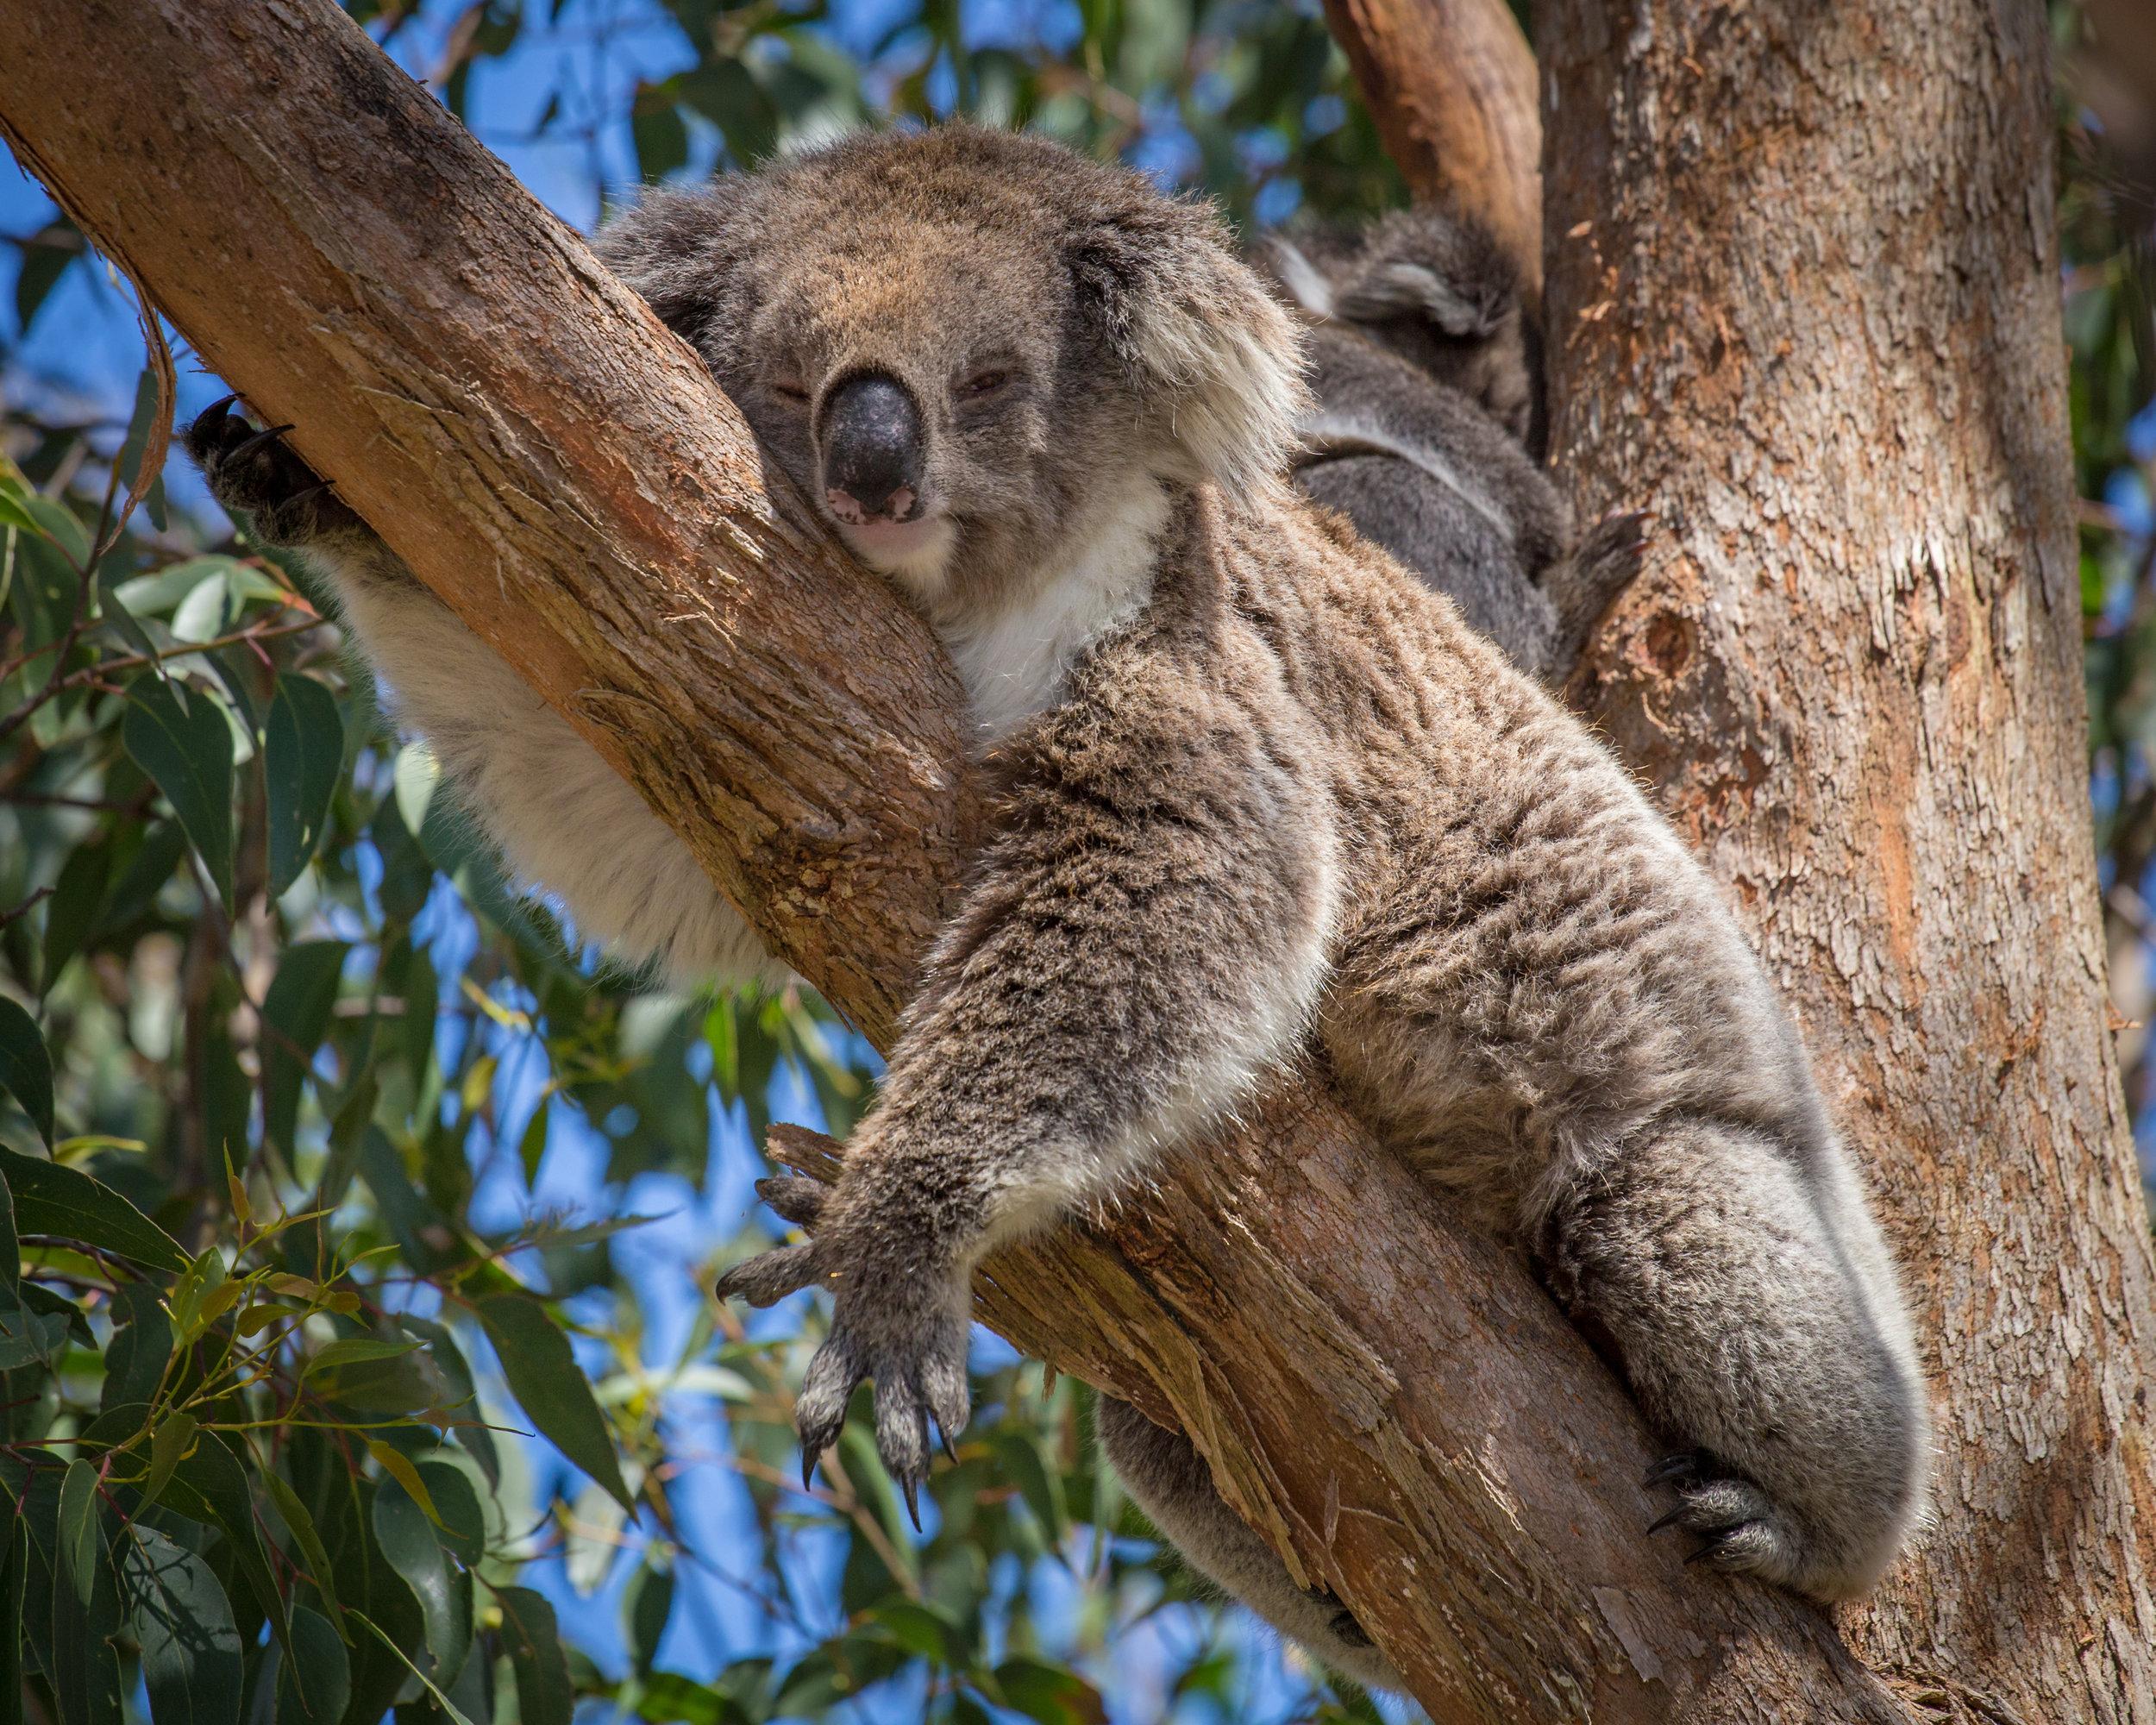 koala-in-tree-P74C5UP.jpg